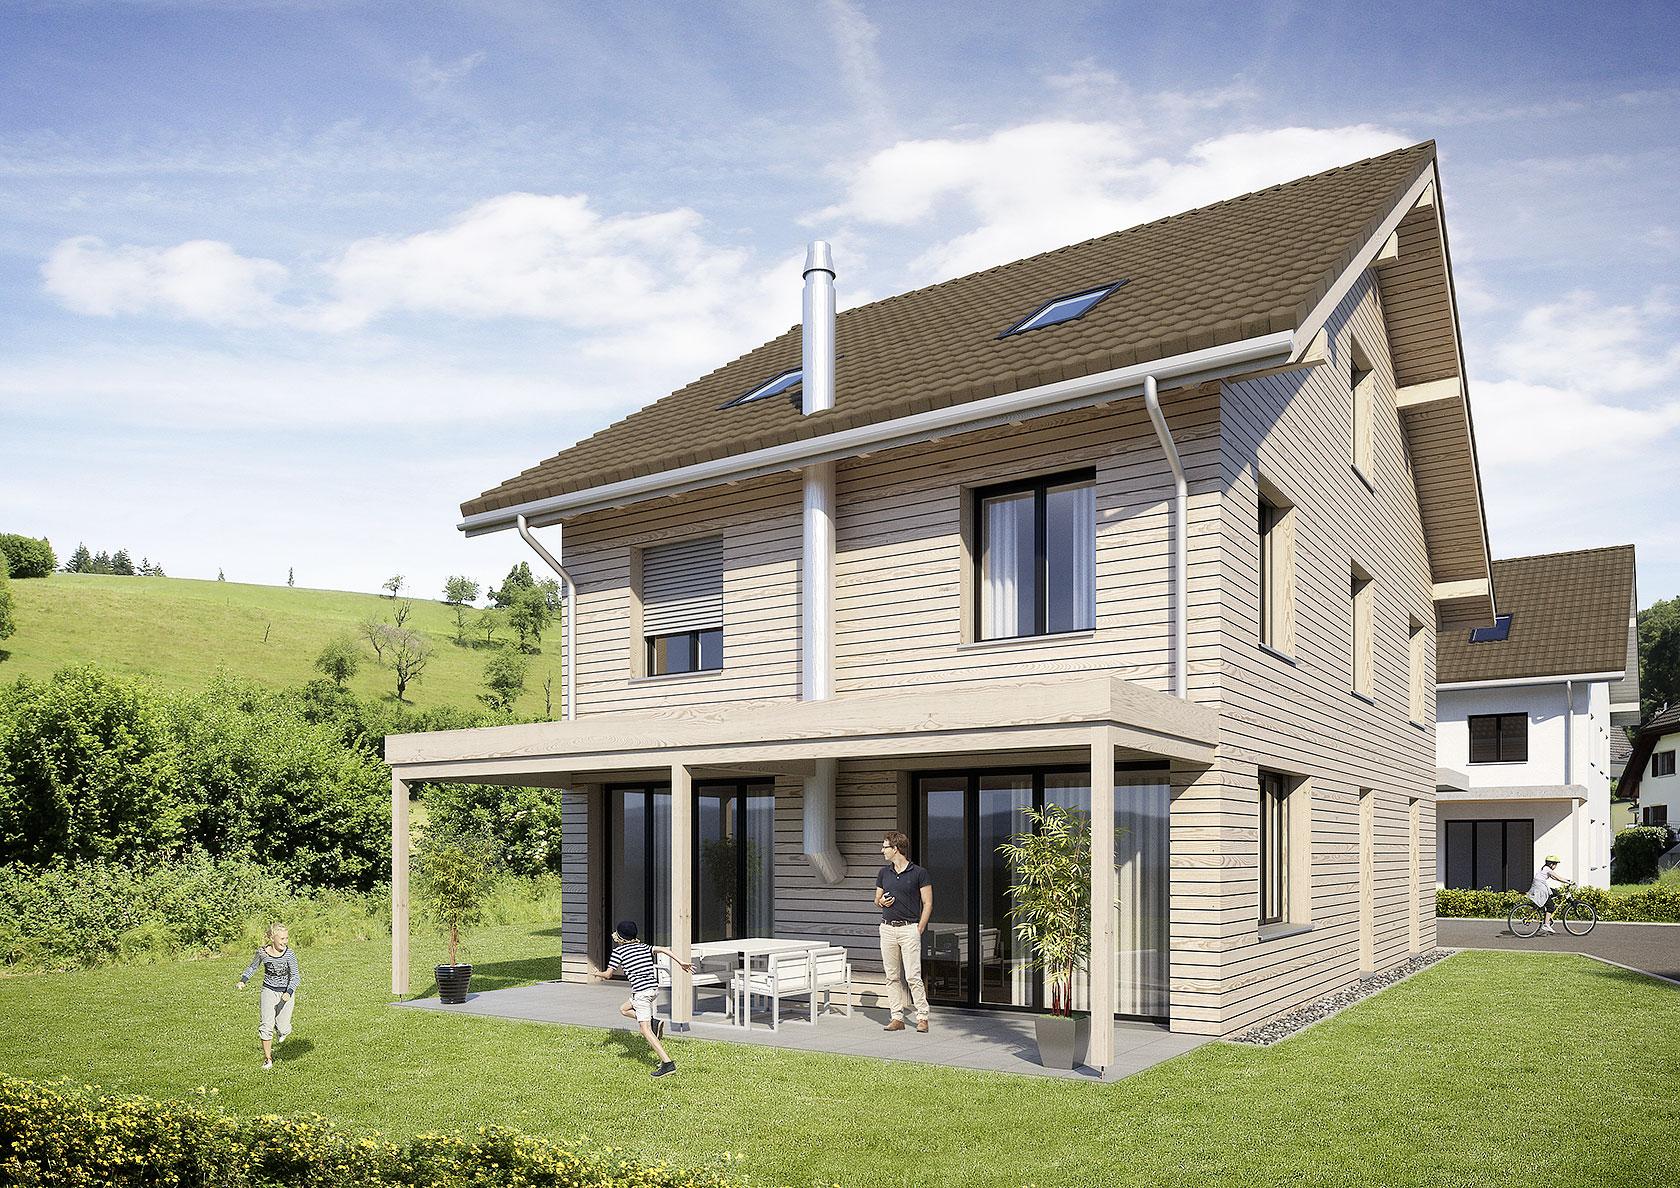 Holz berge swiss interactive ag architektur for Visuelle architektur